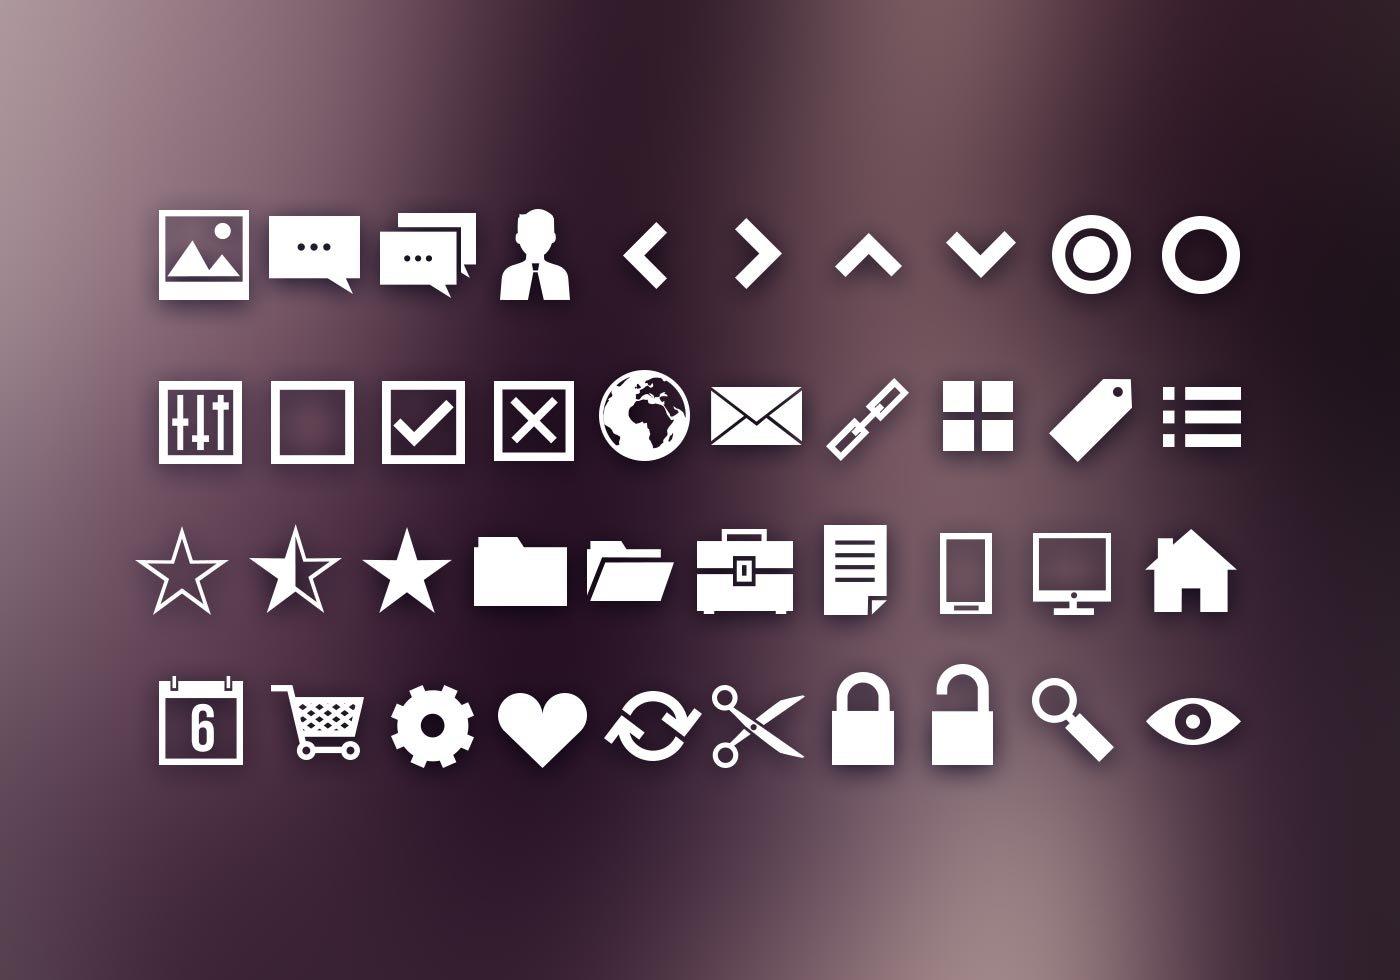 40 ui icons shapes free photoshop shapes at brusheezy. Black Bedroom Furniture Sets. Home Design Ideas